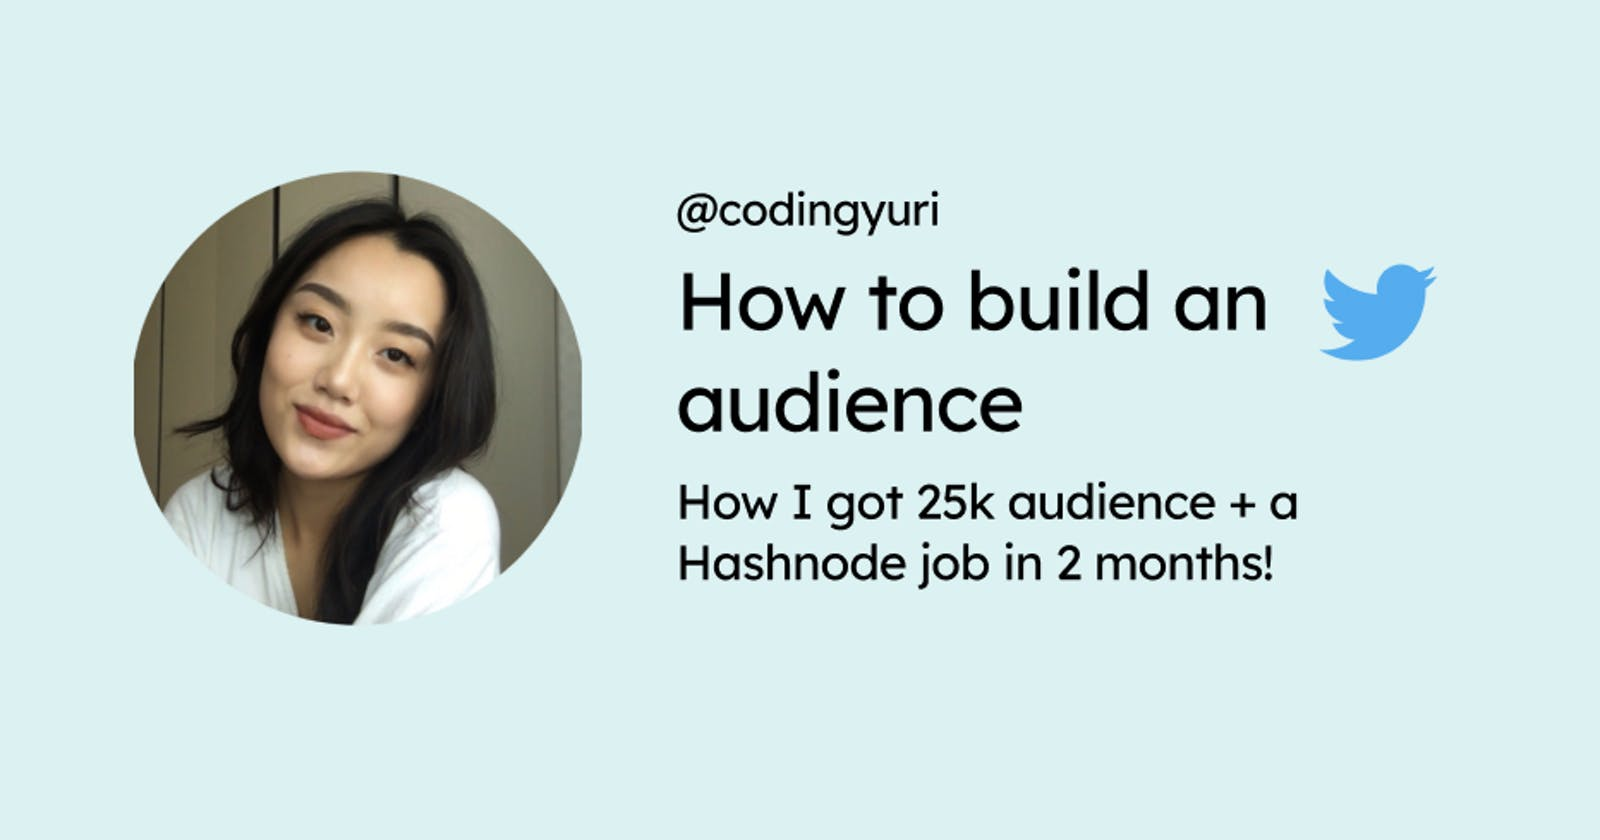 I got 25K followers & a job at Hashnode within 2 months in Tech Twitter! My advice.